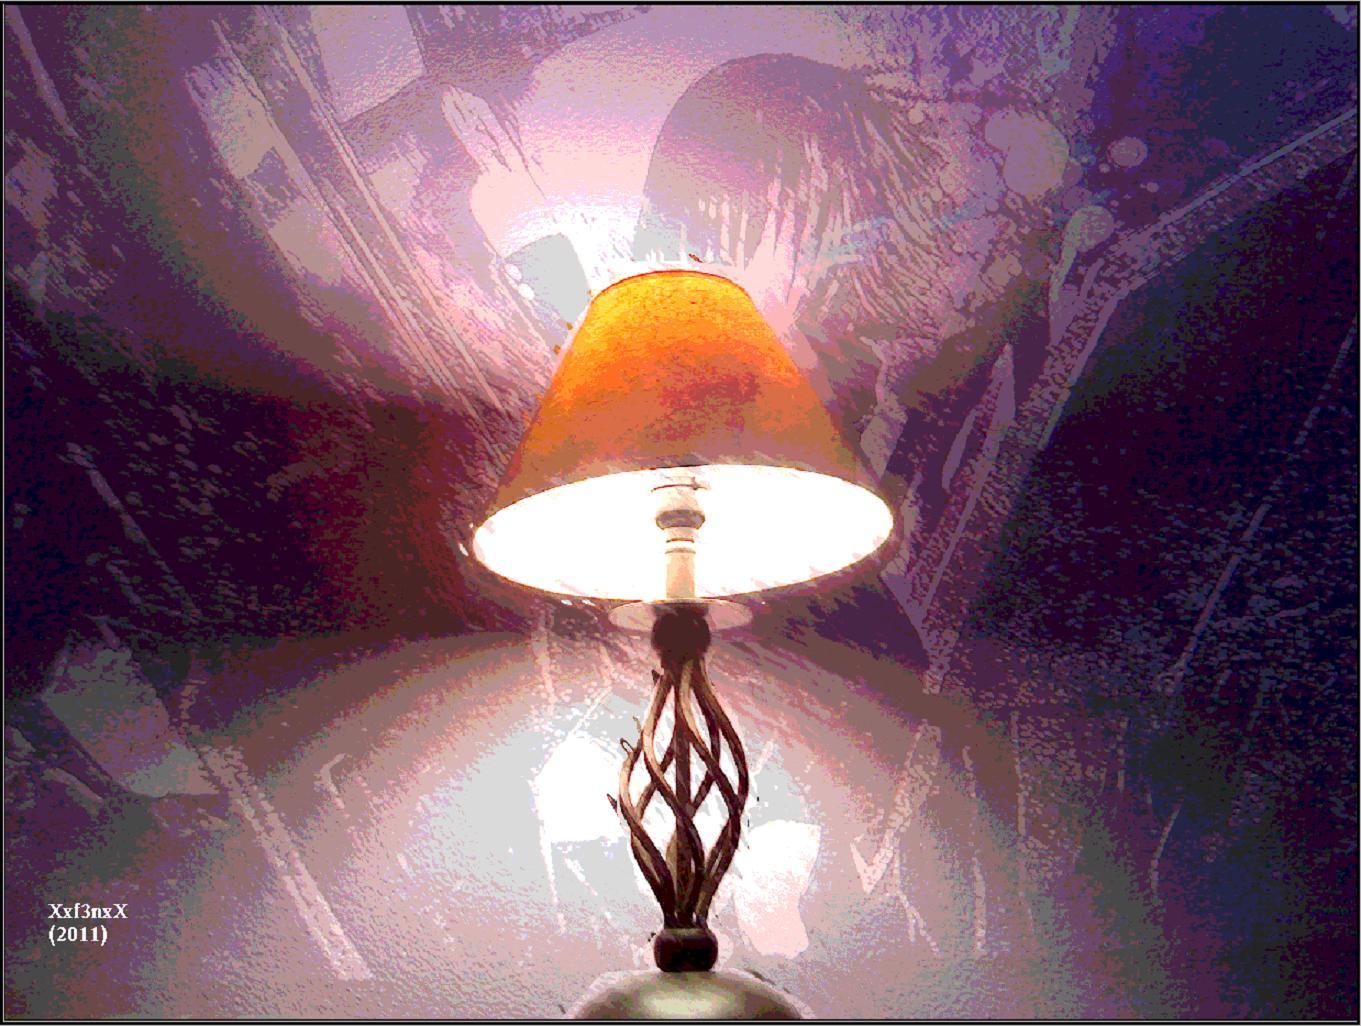 lampz revamp'd